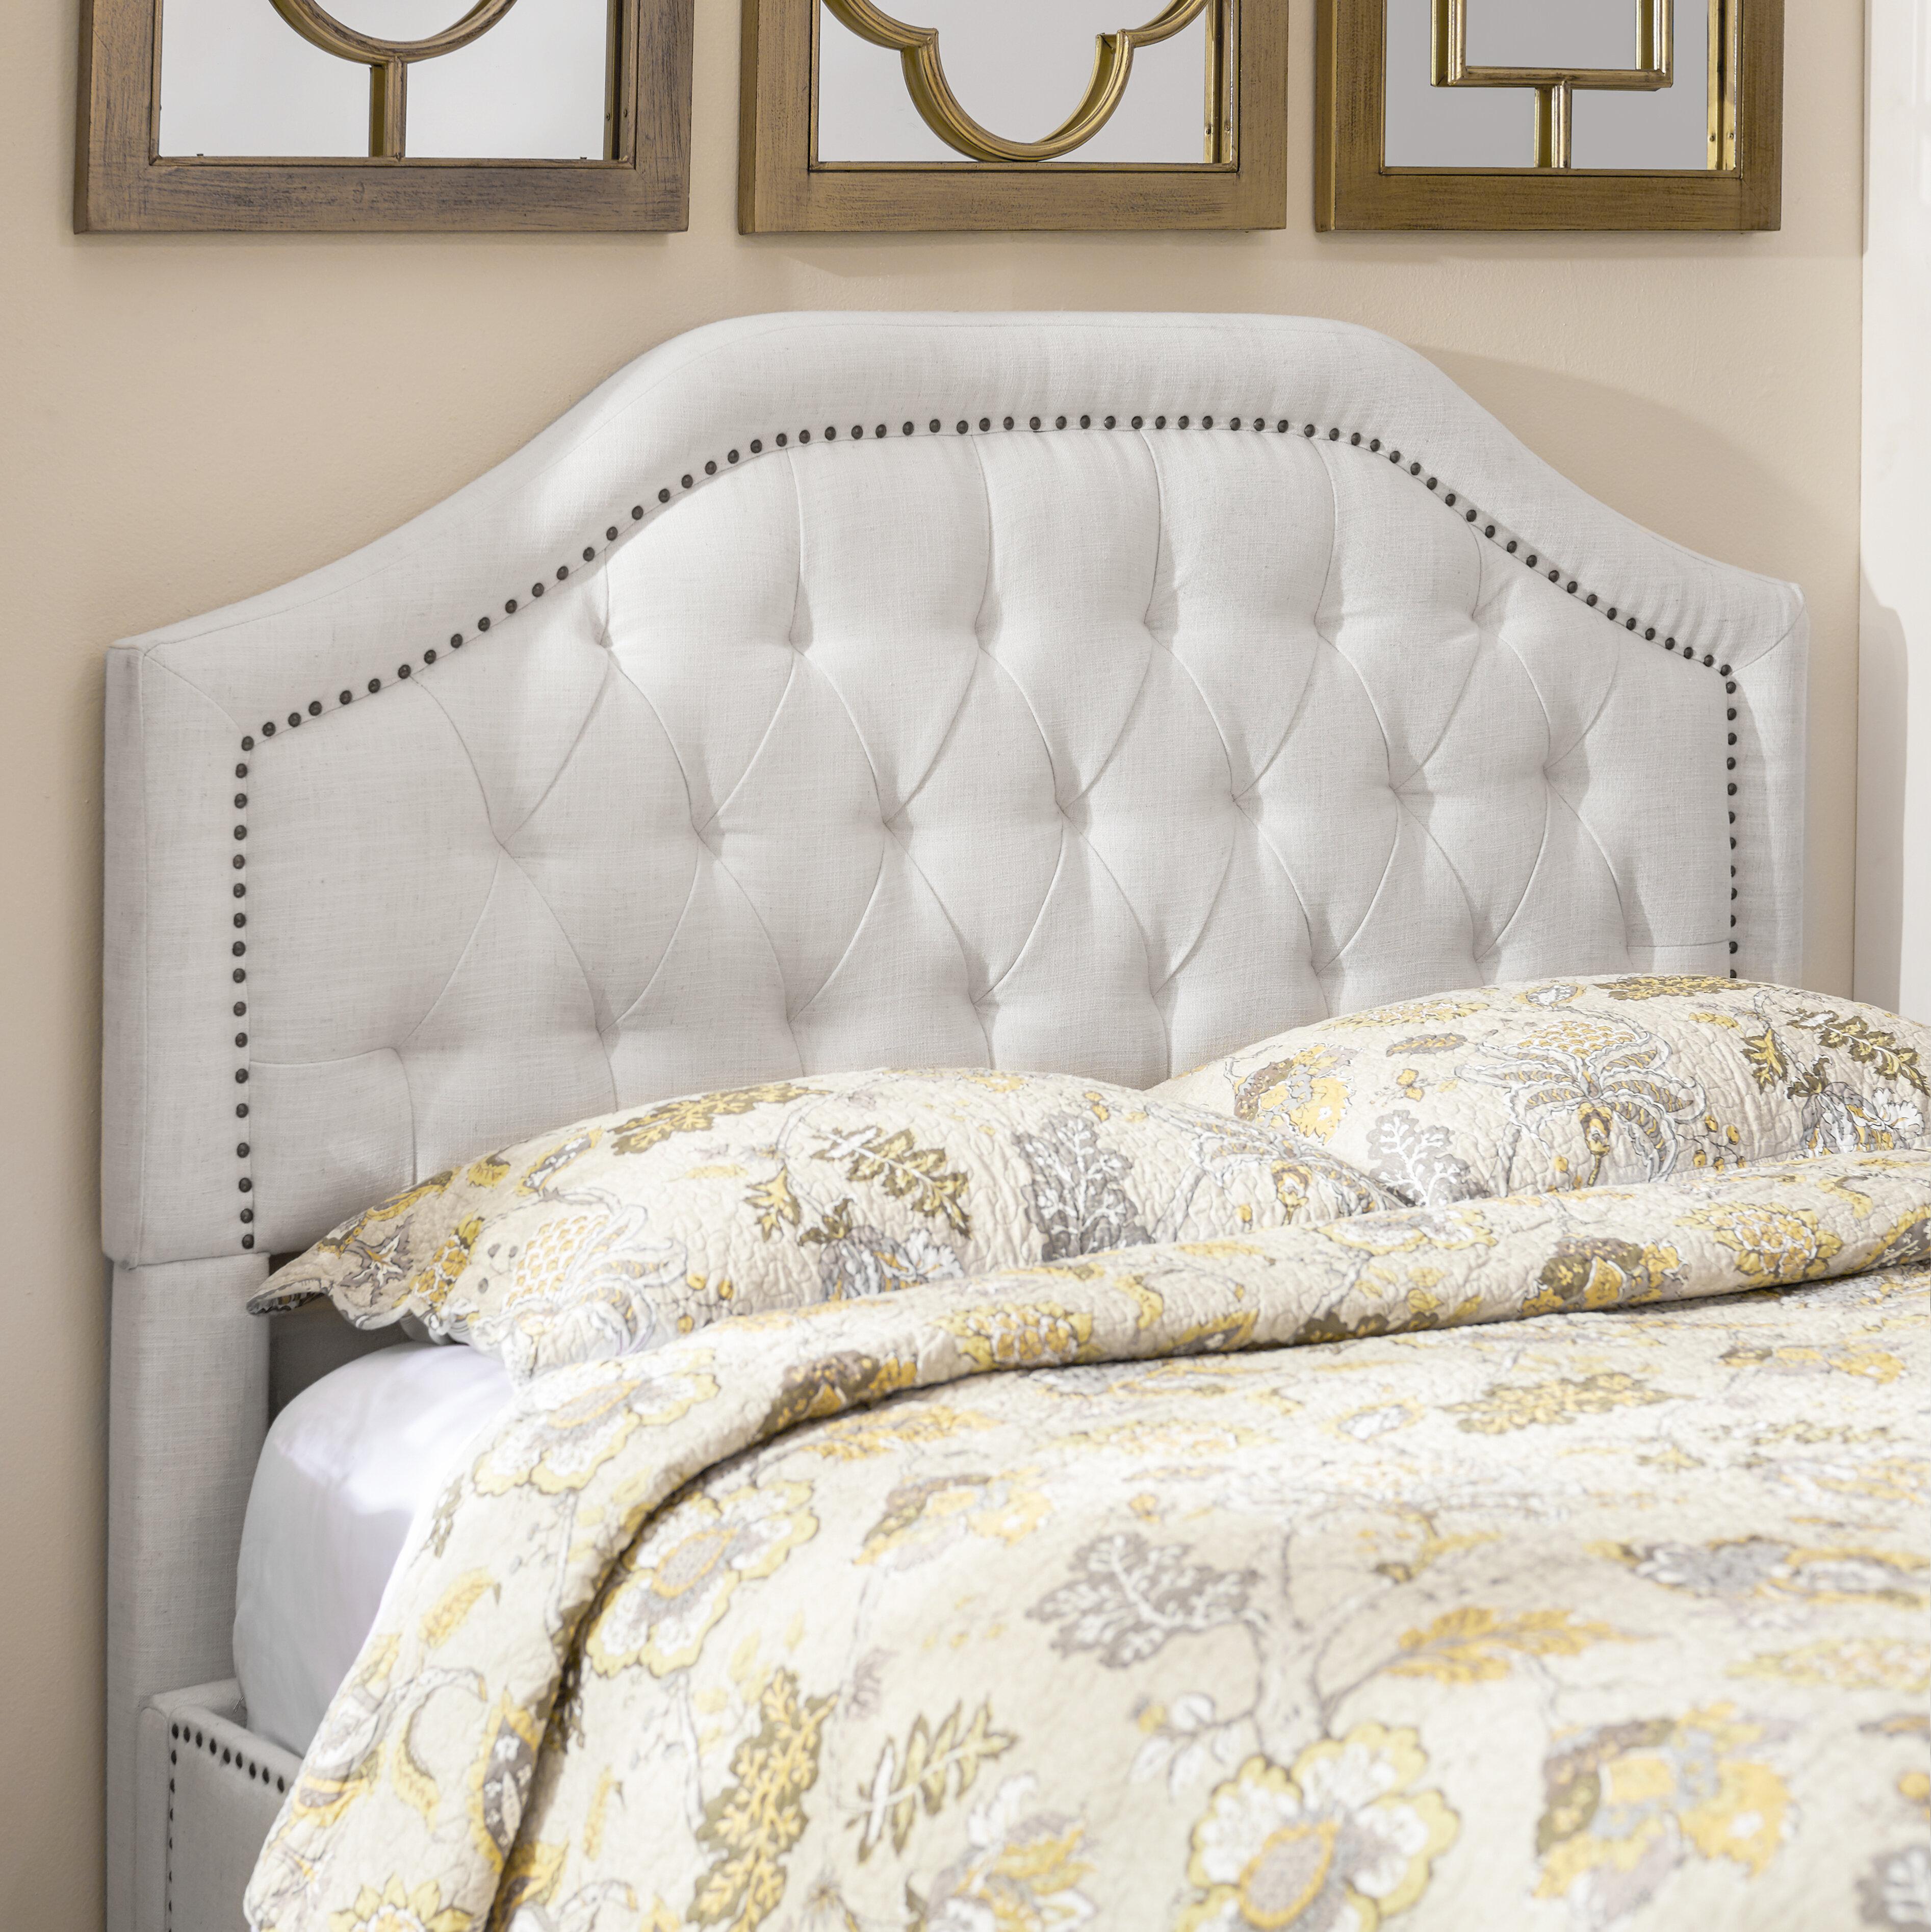 cover geometric catalog bed covers jsp alt scallop kohl duvet bath s bedding